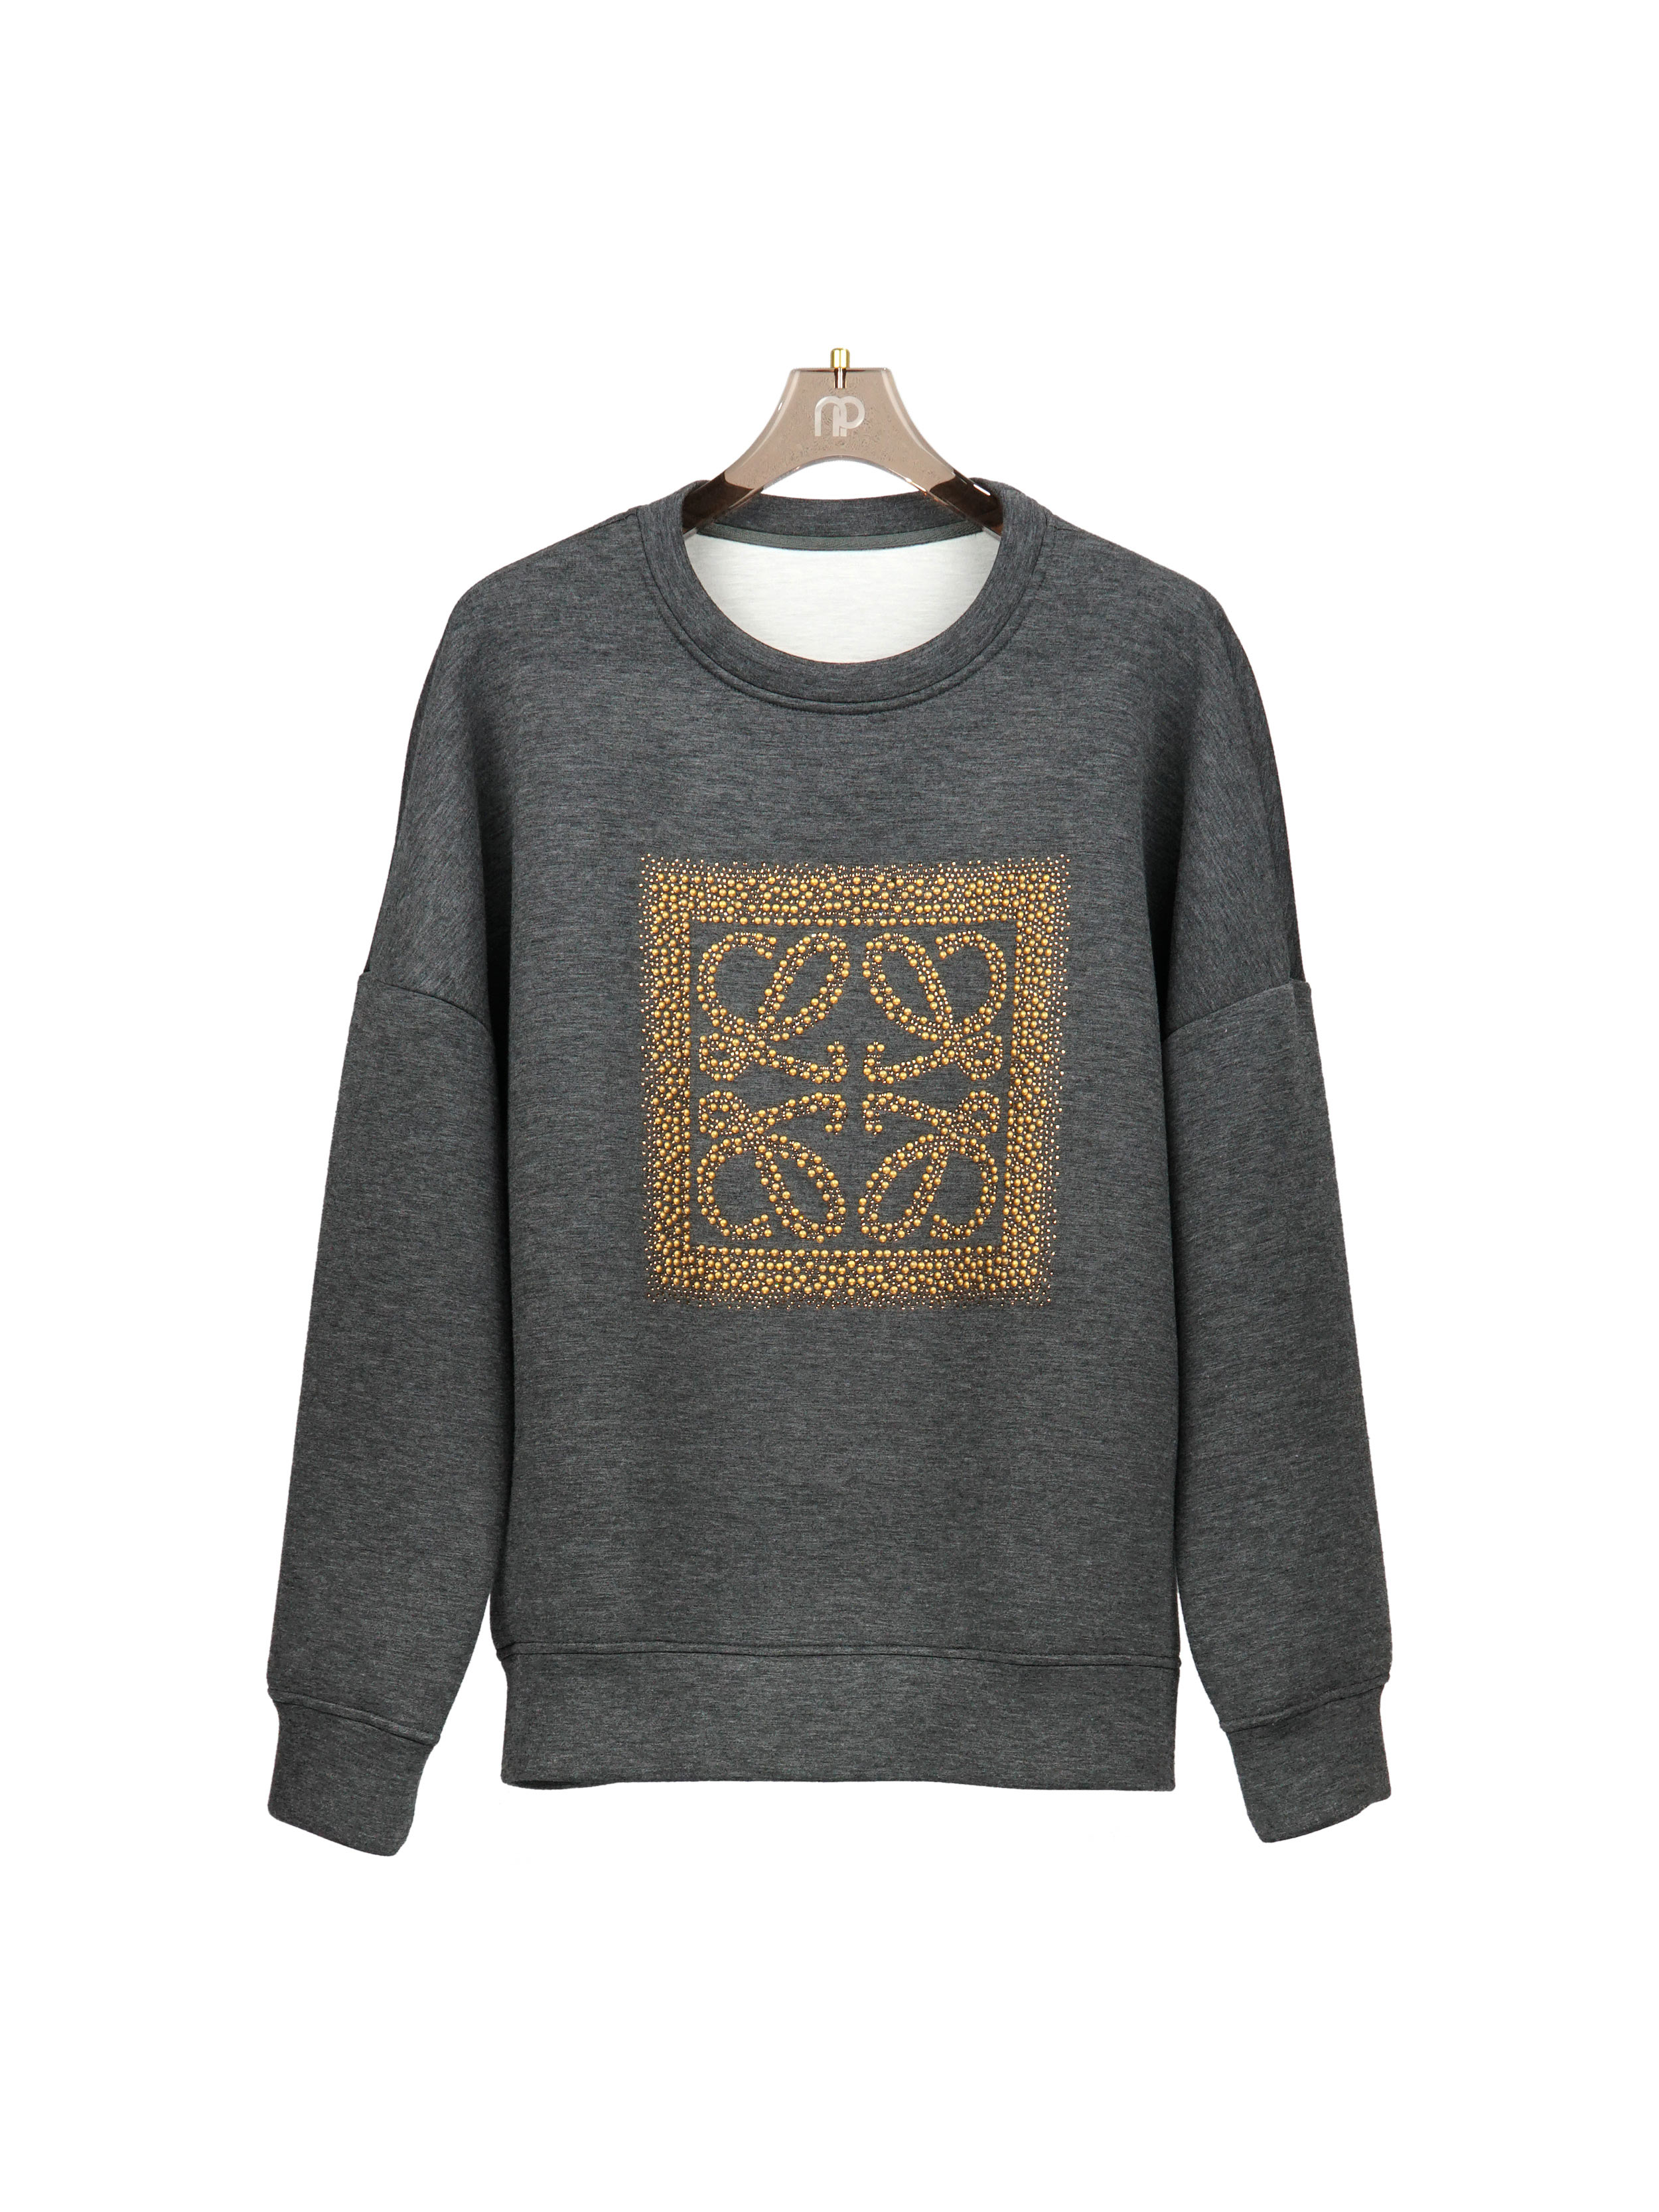 Sweatshirt logo đính đá